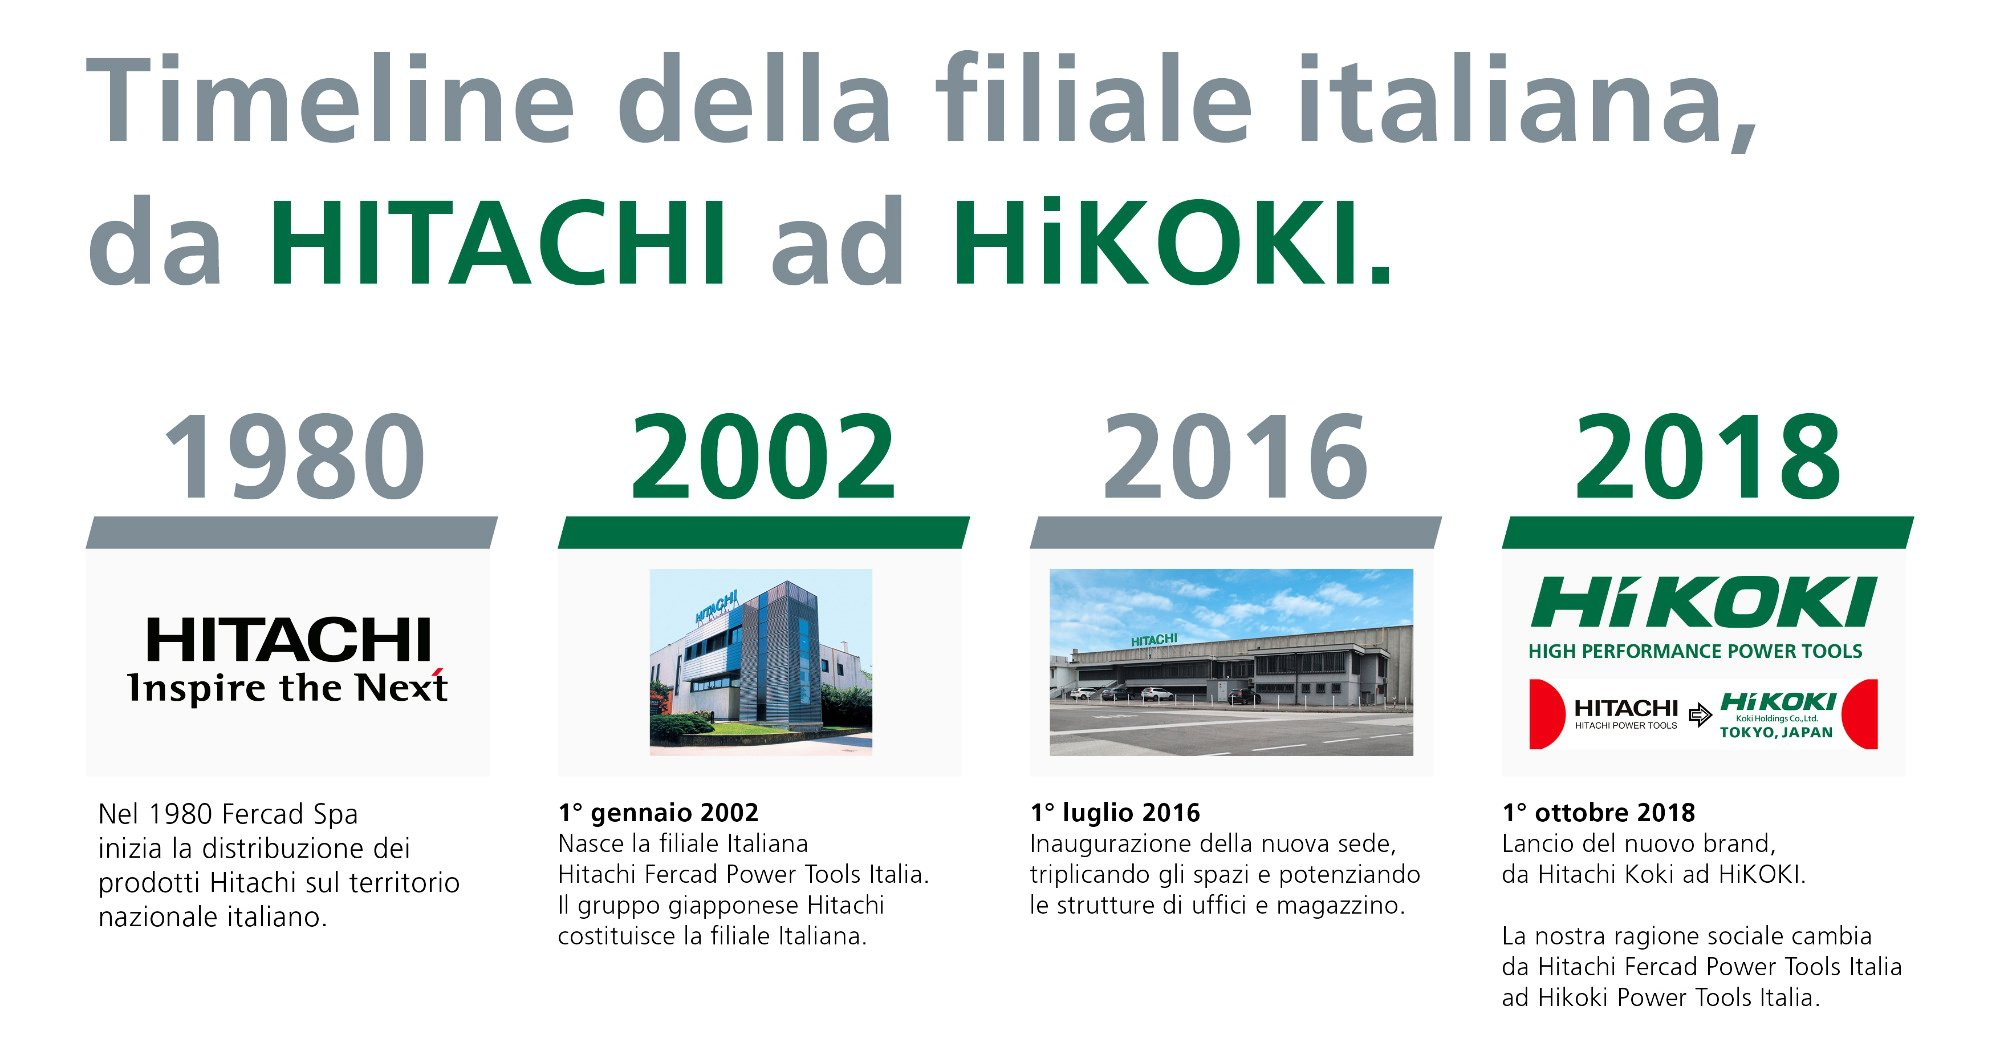 Azienda Timeline_Hitachi_ad_HiKOKI_itali.jpg (Art. corrente, Pag. 1, Foto normale)